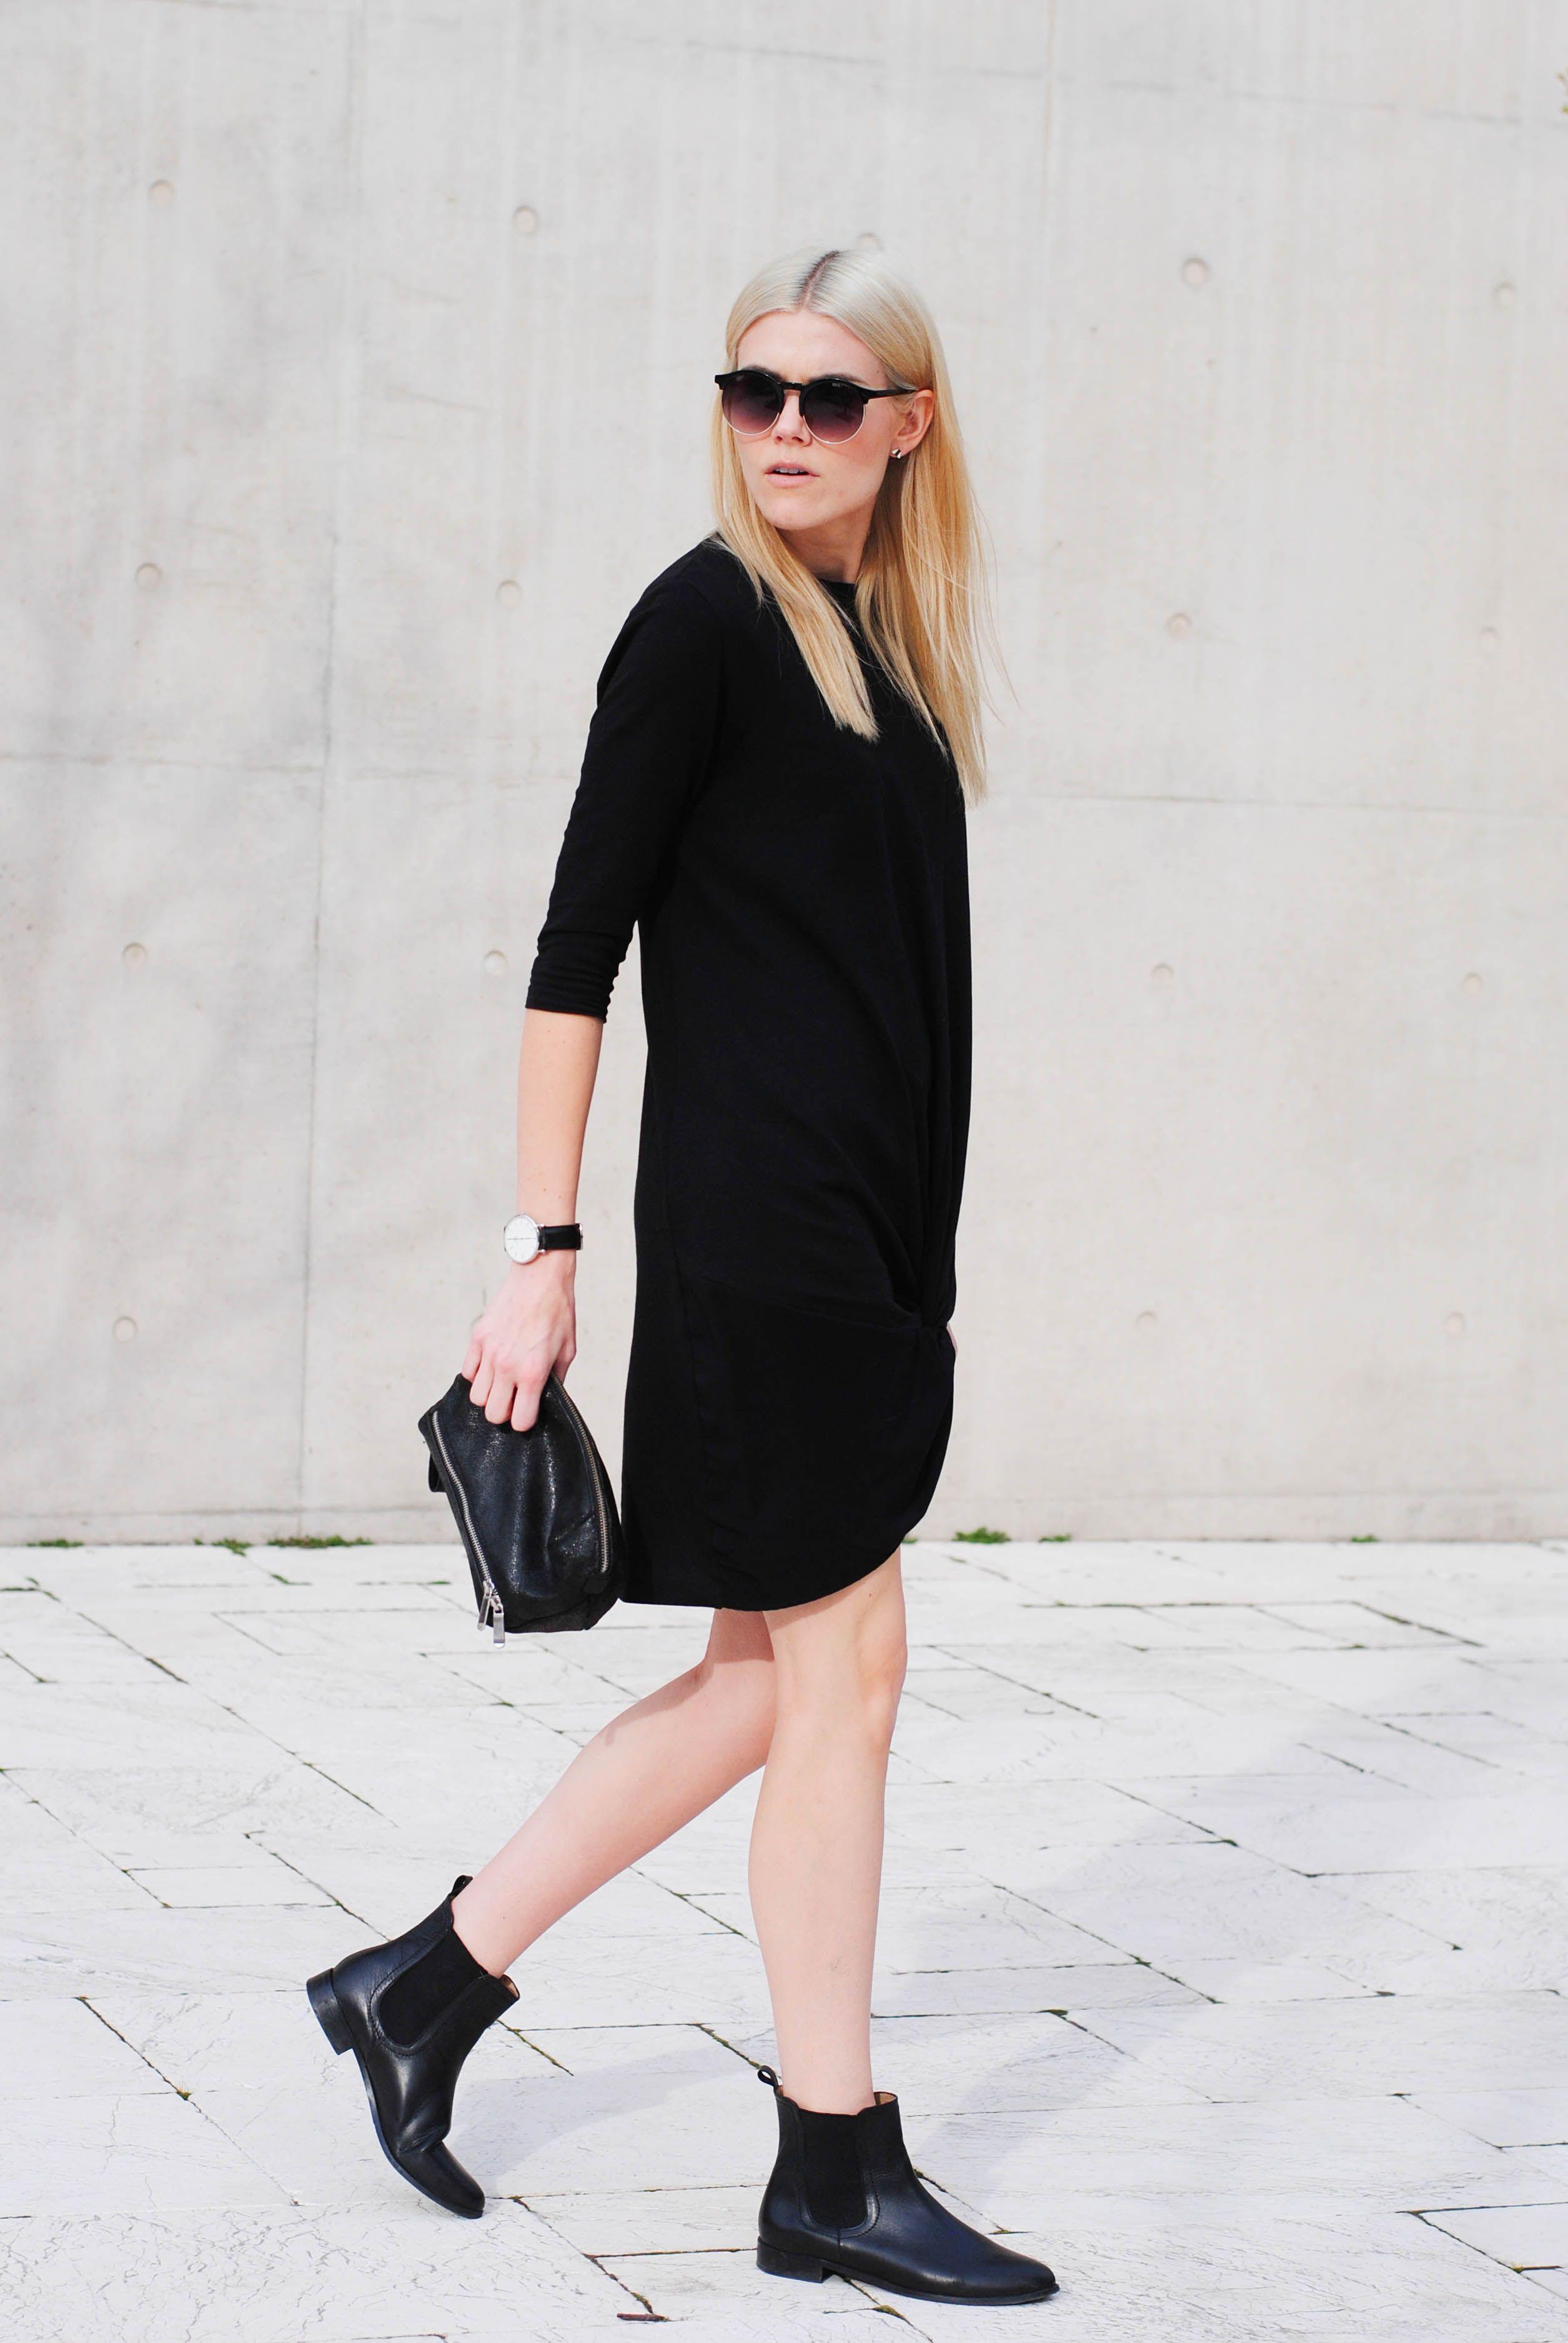 Shorty Fashion Minimal Fashion Minimalist Fashion [ 3750 x 2510 Pixel ]